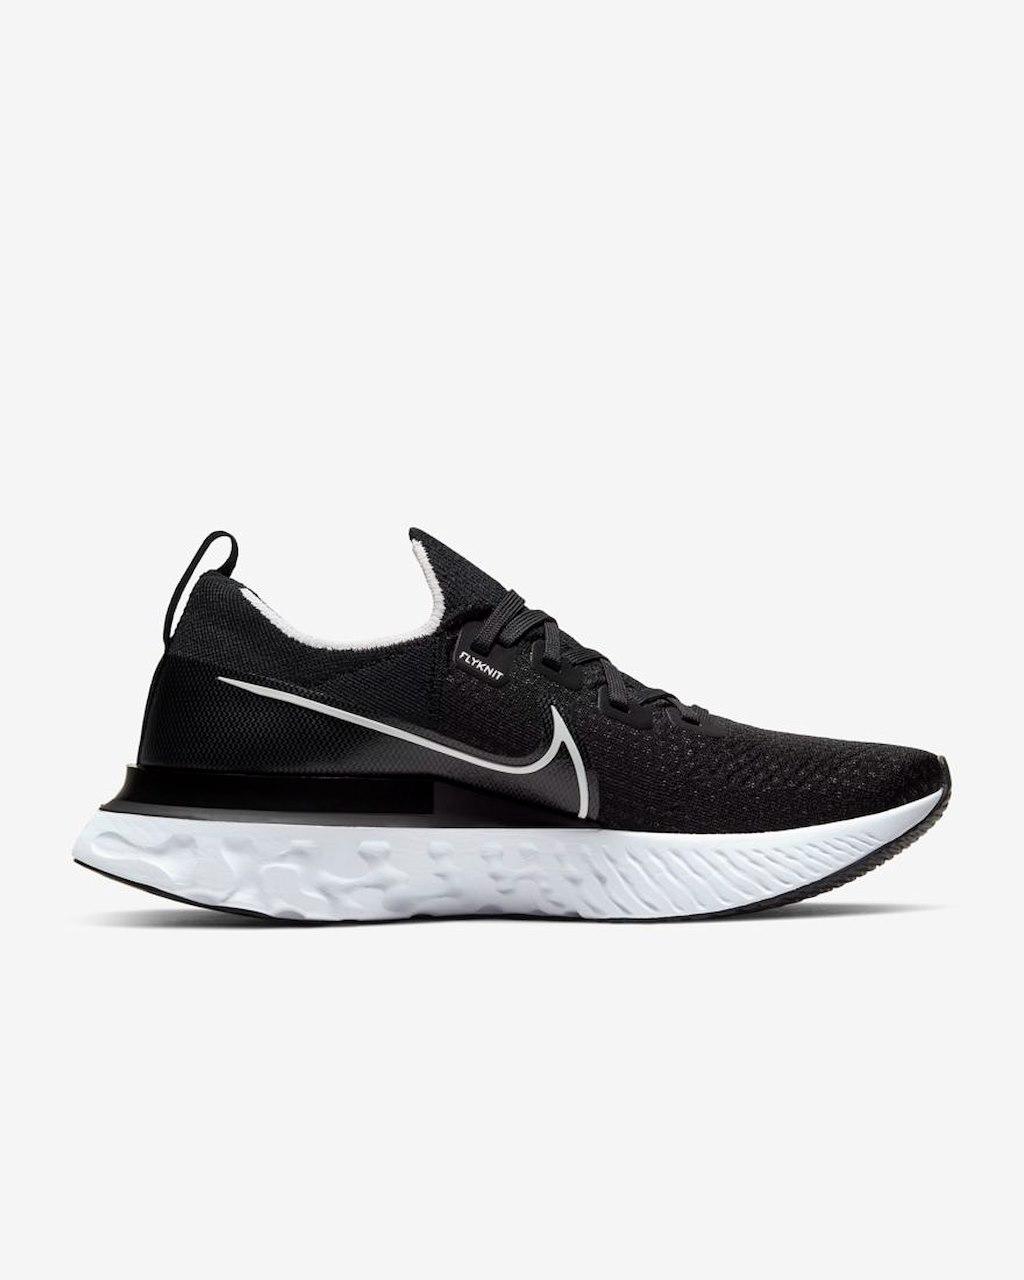 Nike React Infinity Run Flyknit Men